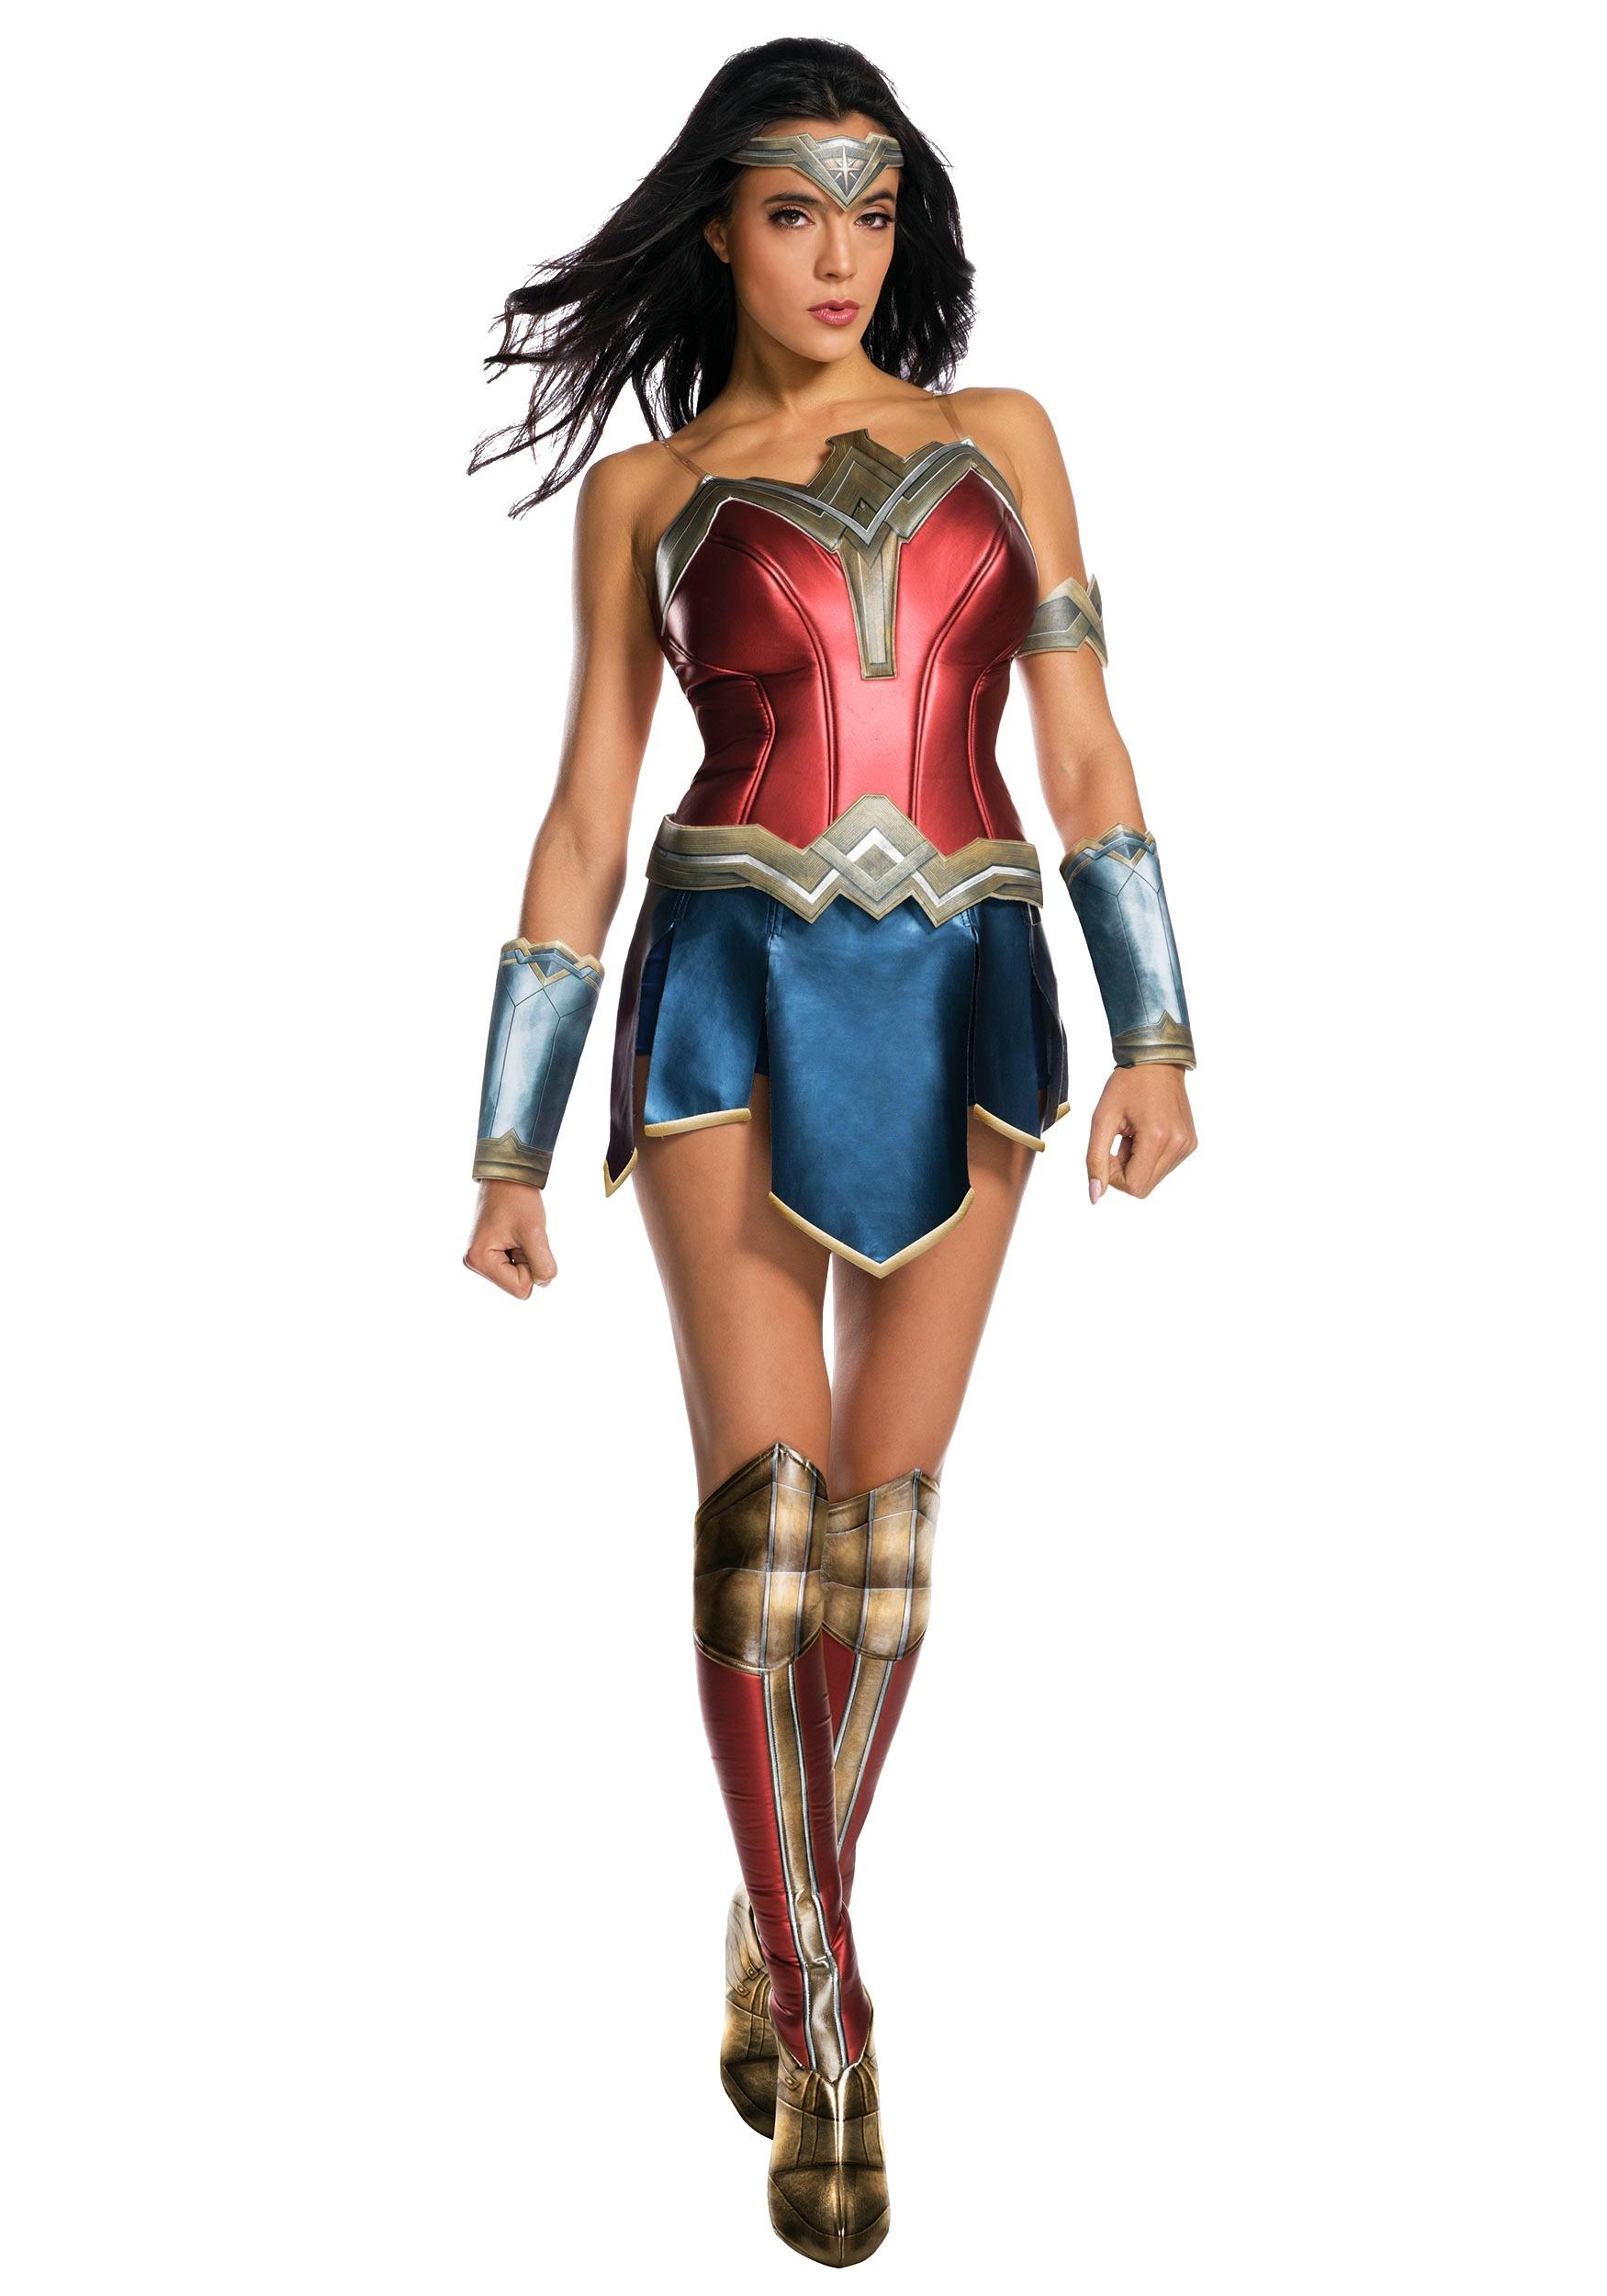 wonder woman costumes - adult wonder woman costume